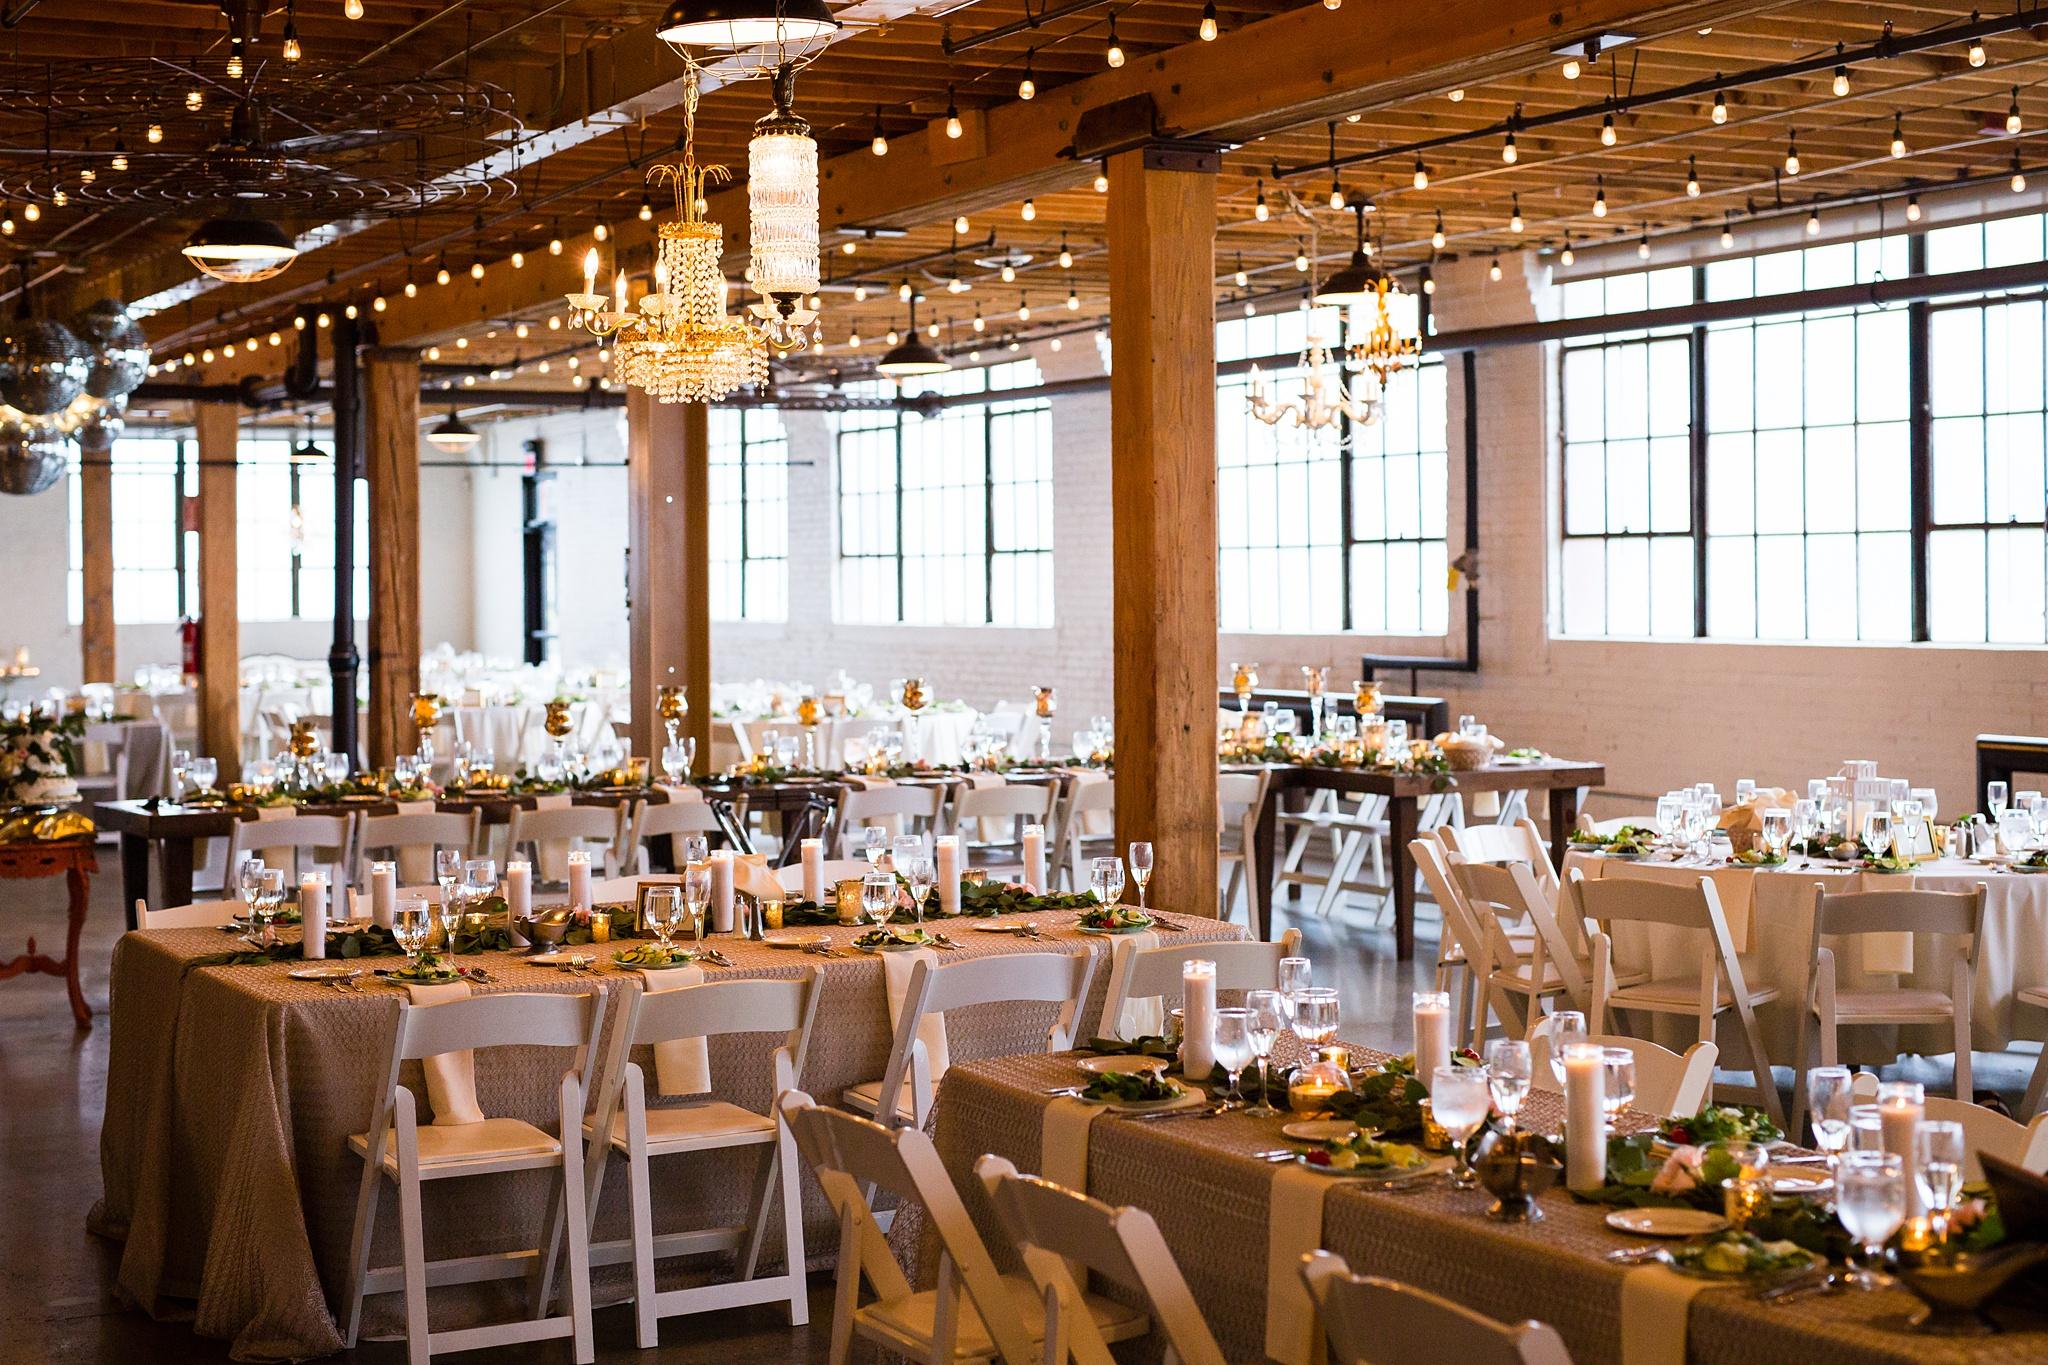 Meghan_Drew_Grand_Rapids_Cheney_place_Wedding073.JPG